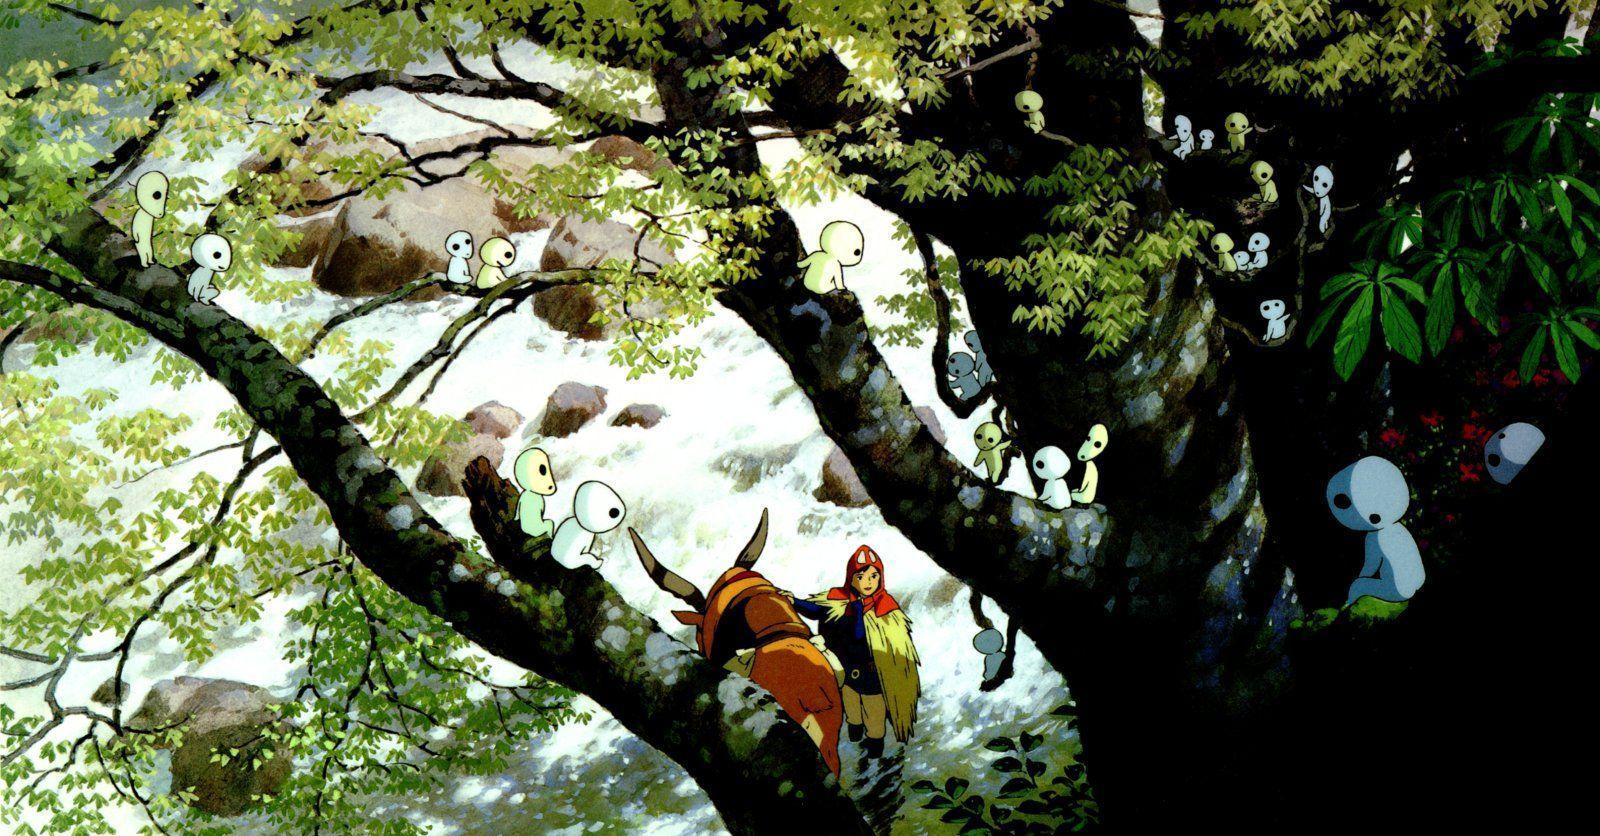 Princess Mononoke Wallpapers - Wallpaper Cave